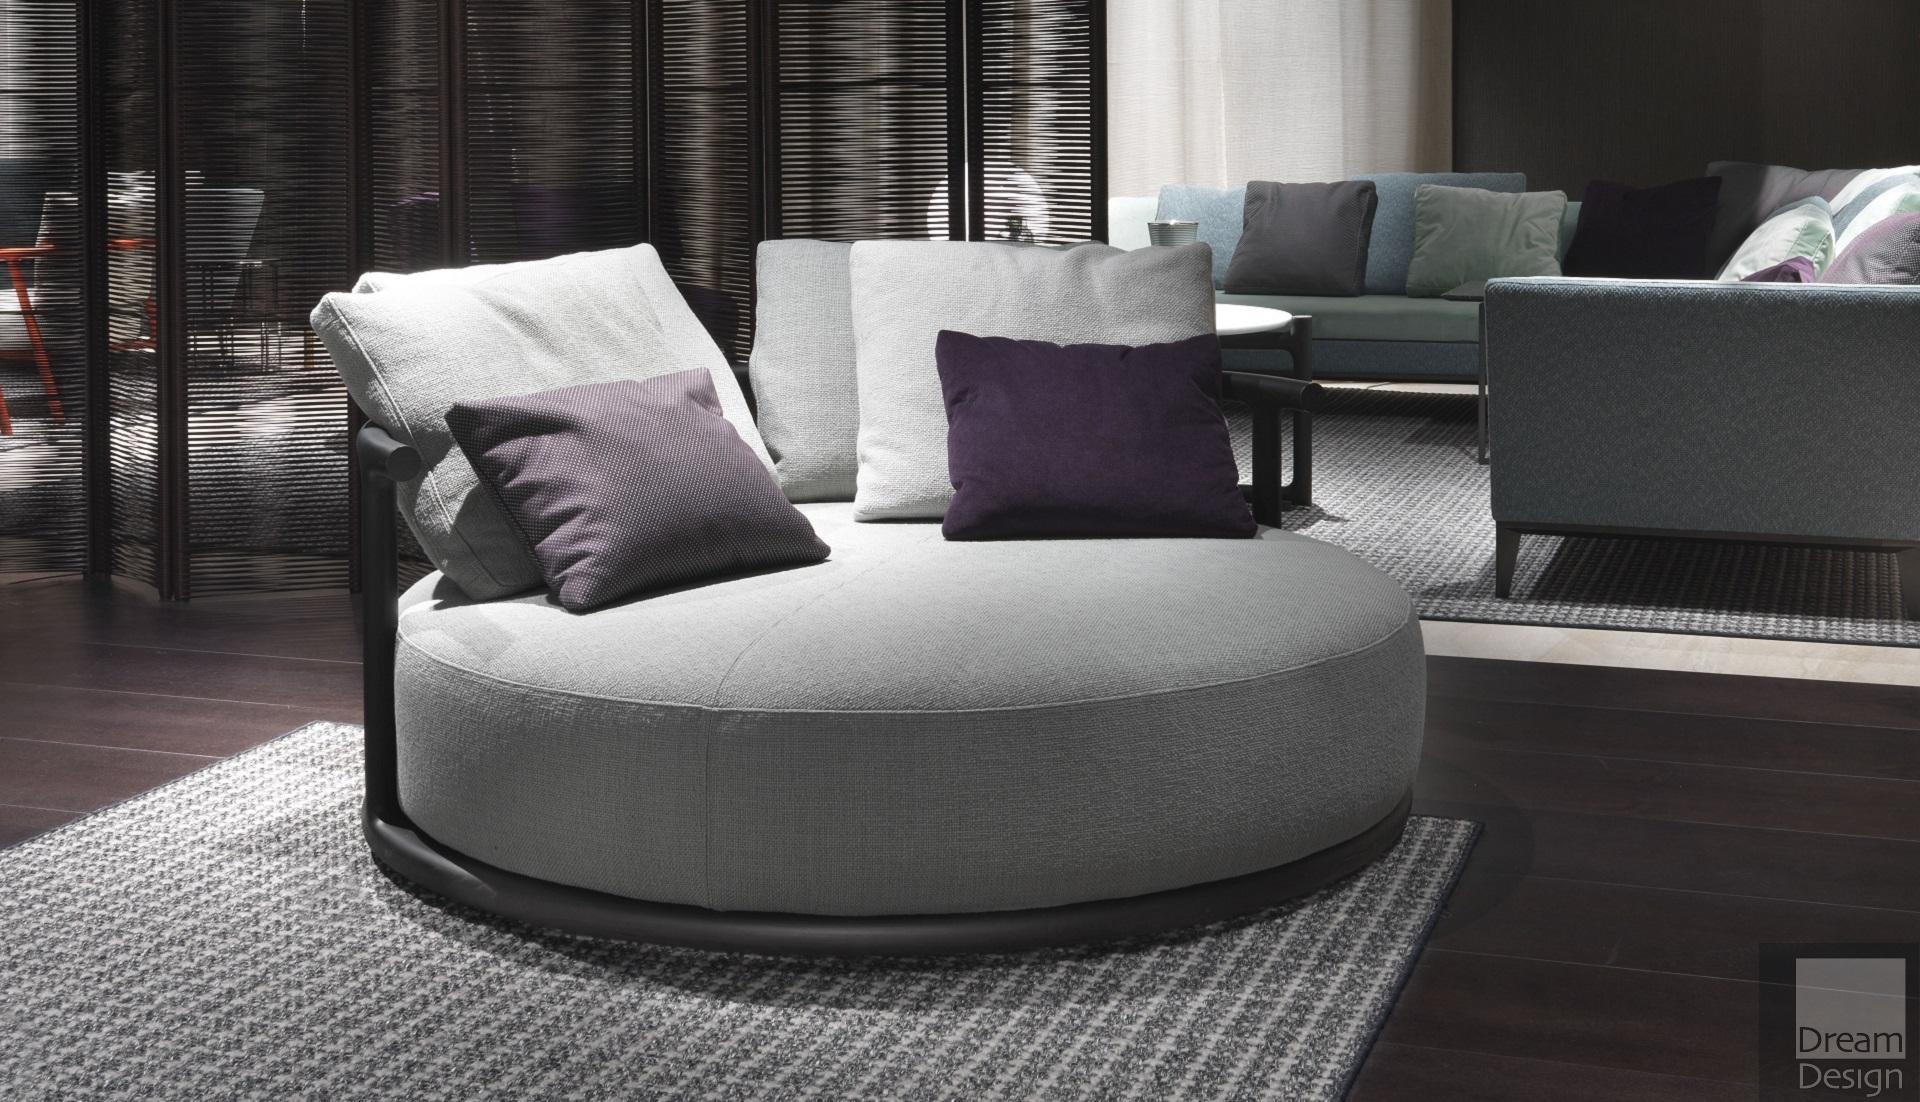 flexform mood icaro round sofa dream design interiors ltd. Black Bedroom Furniture Sets. Home Design Ideas